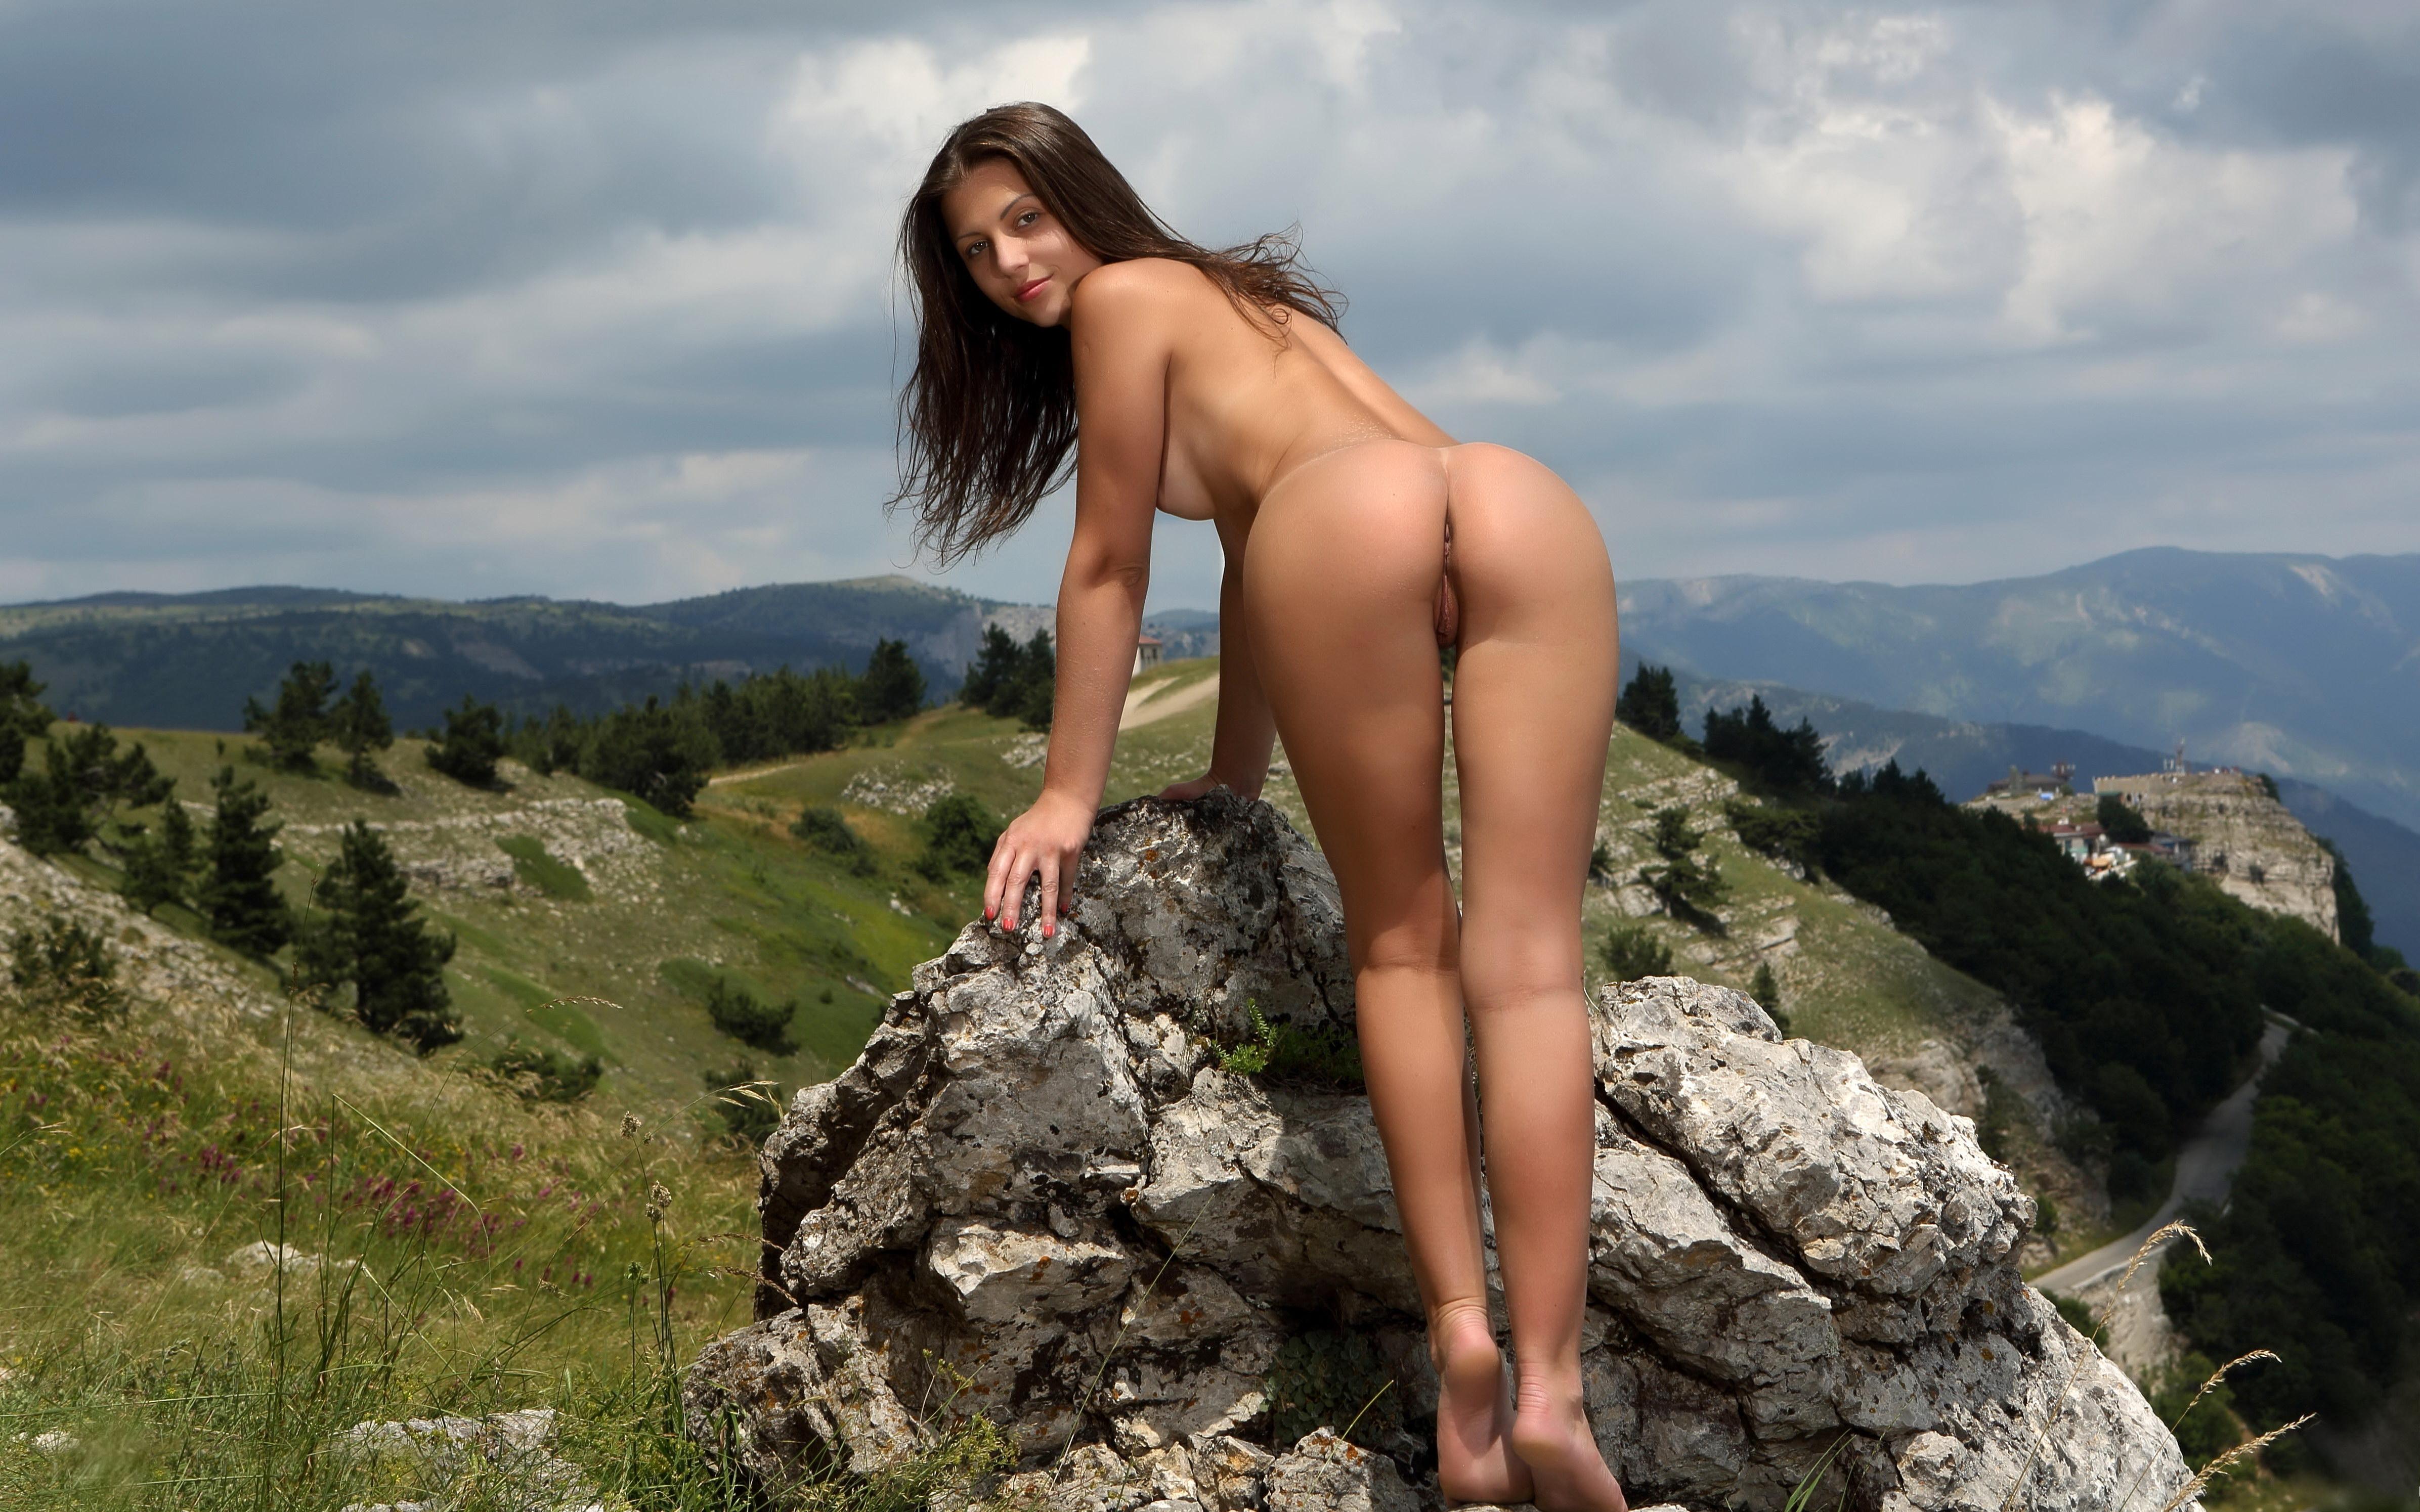 Bareback mountain sex scene